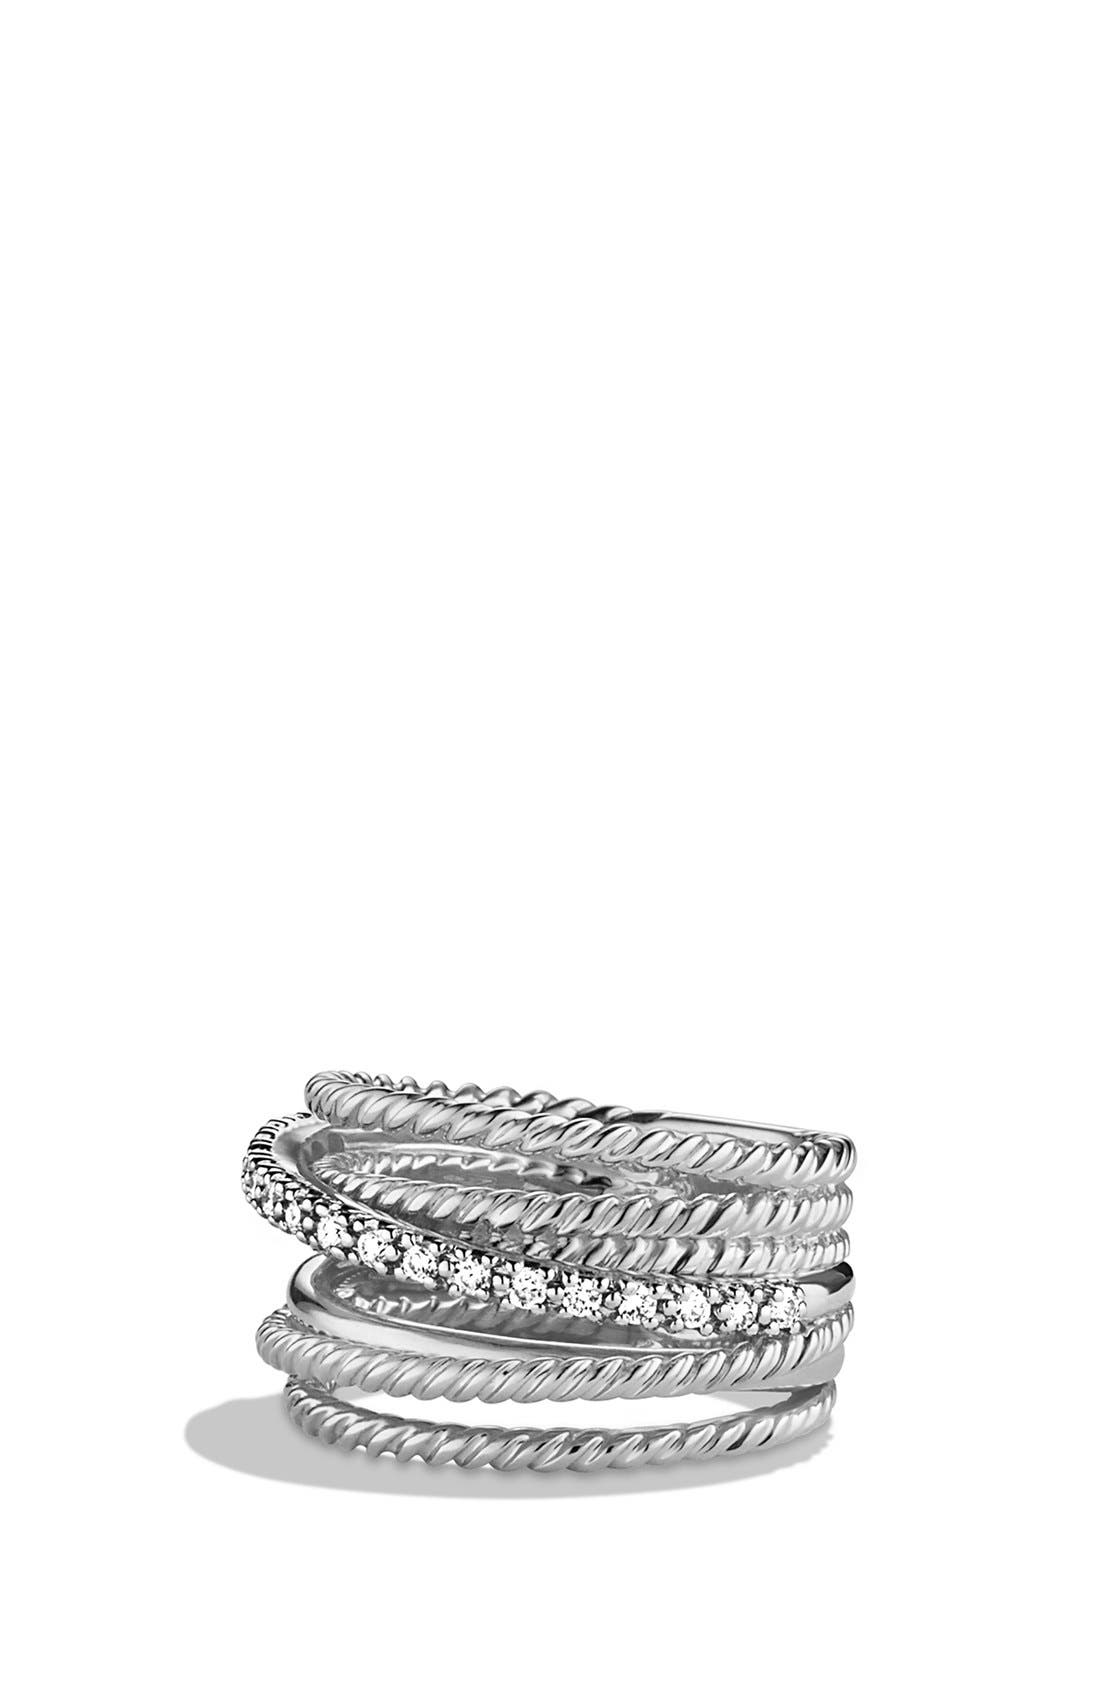 DAVID YURMAN 'Crossover' Wide Ring with Diamonds, Main, color, DIAMOND